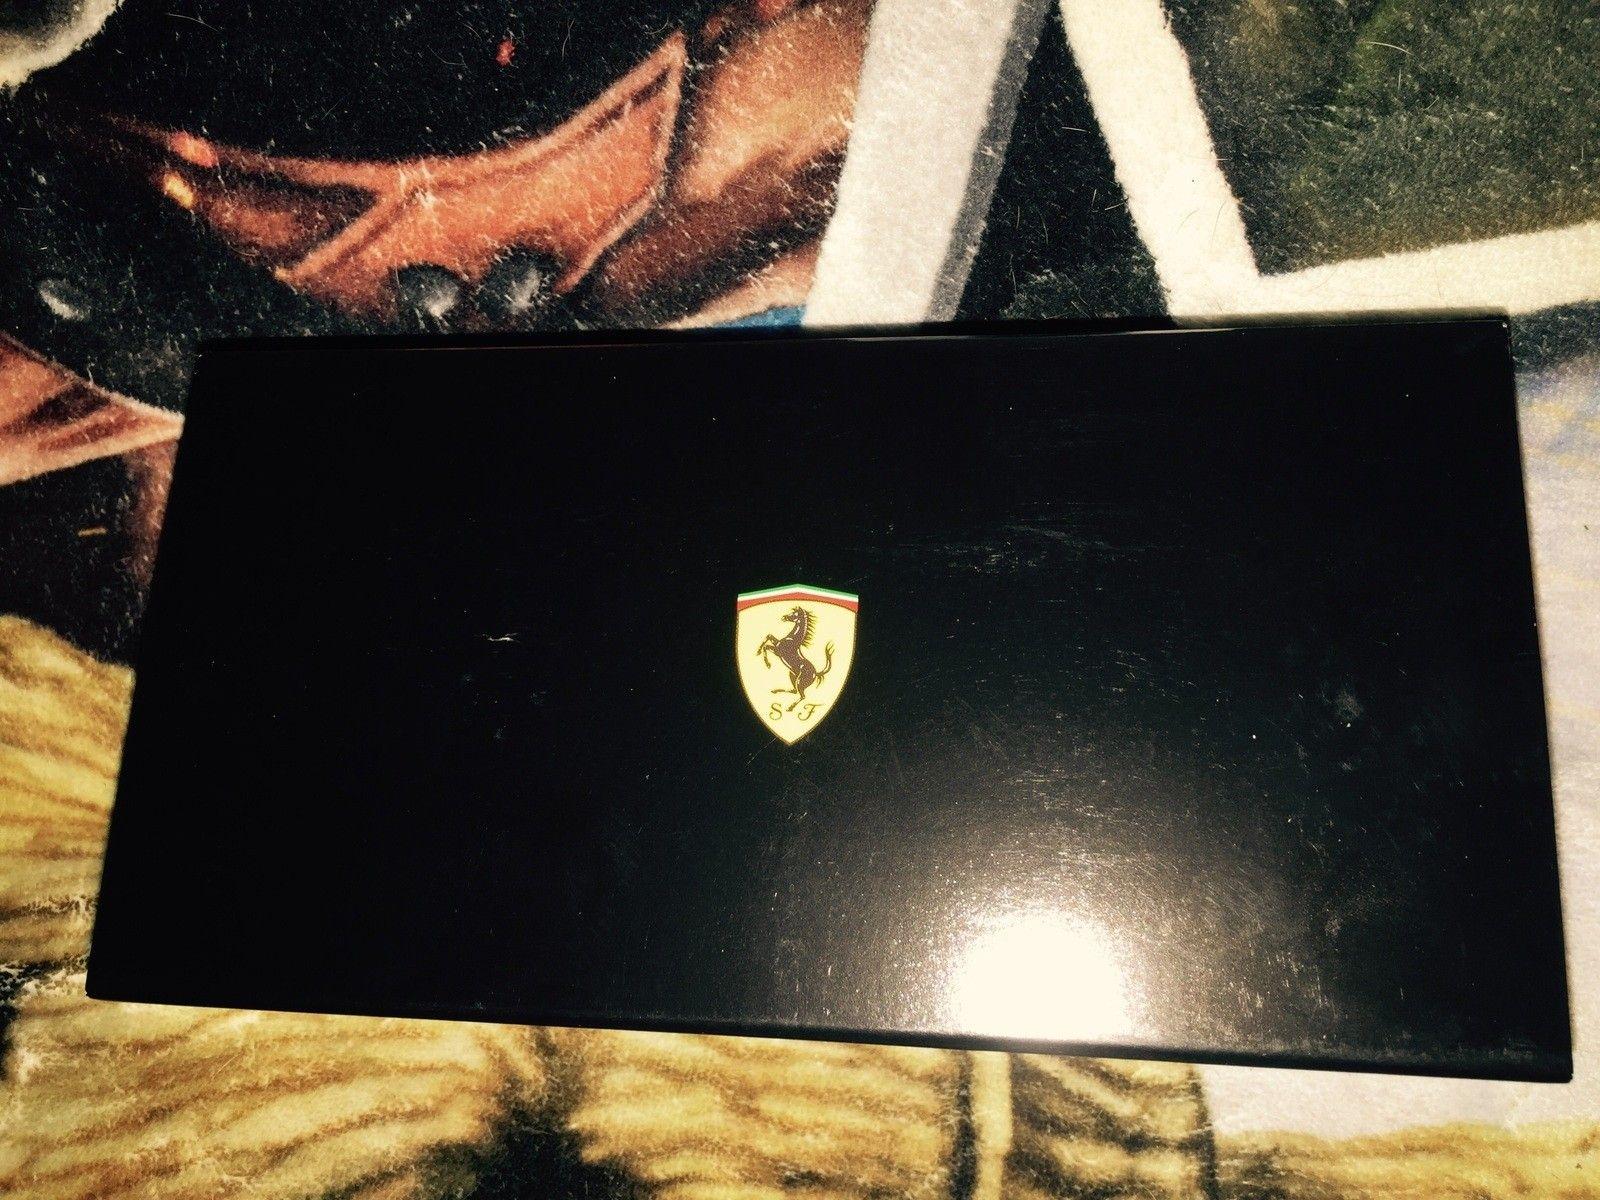 Ferrari Madman  Bnib sealed  sold! - image.jpg